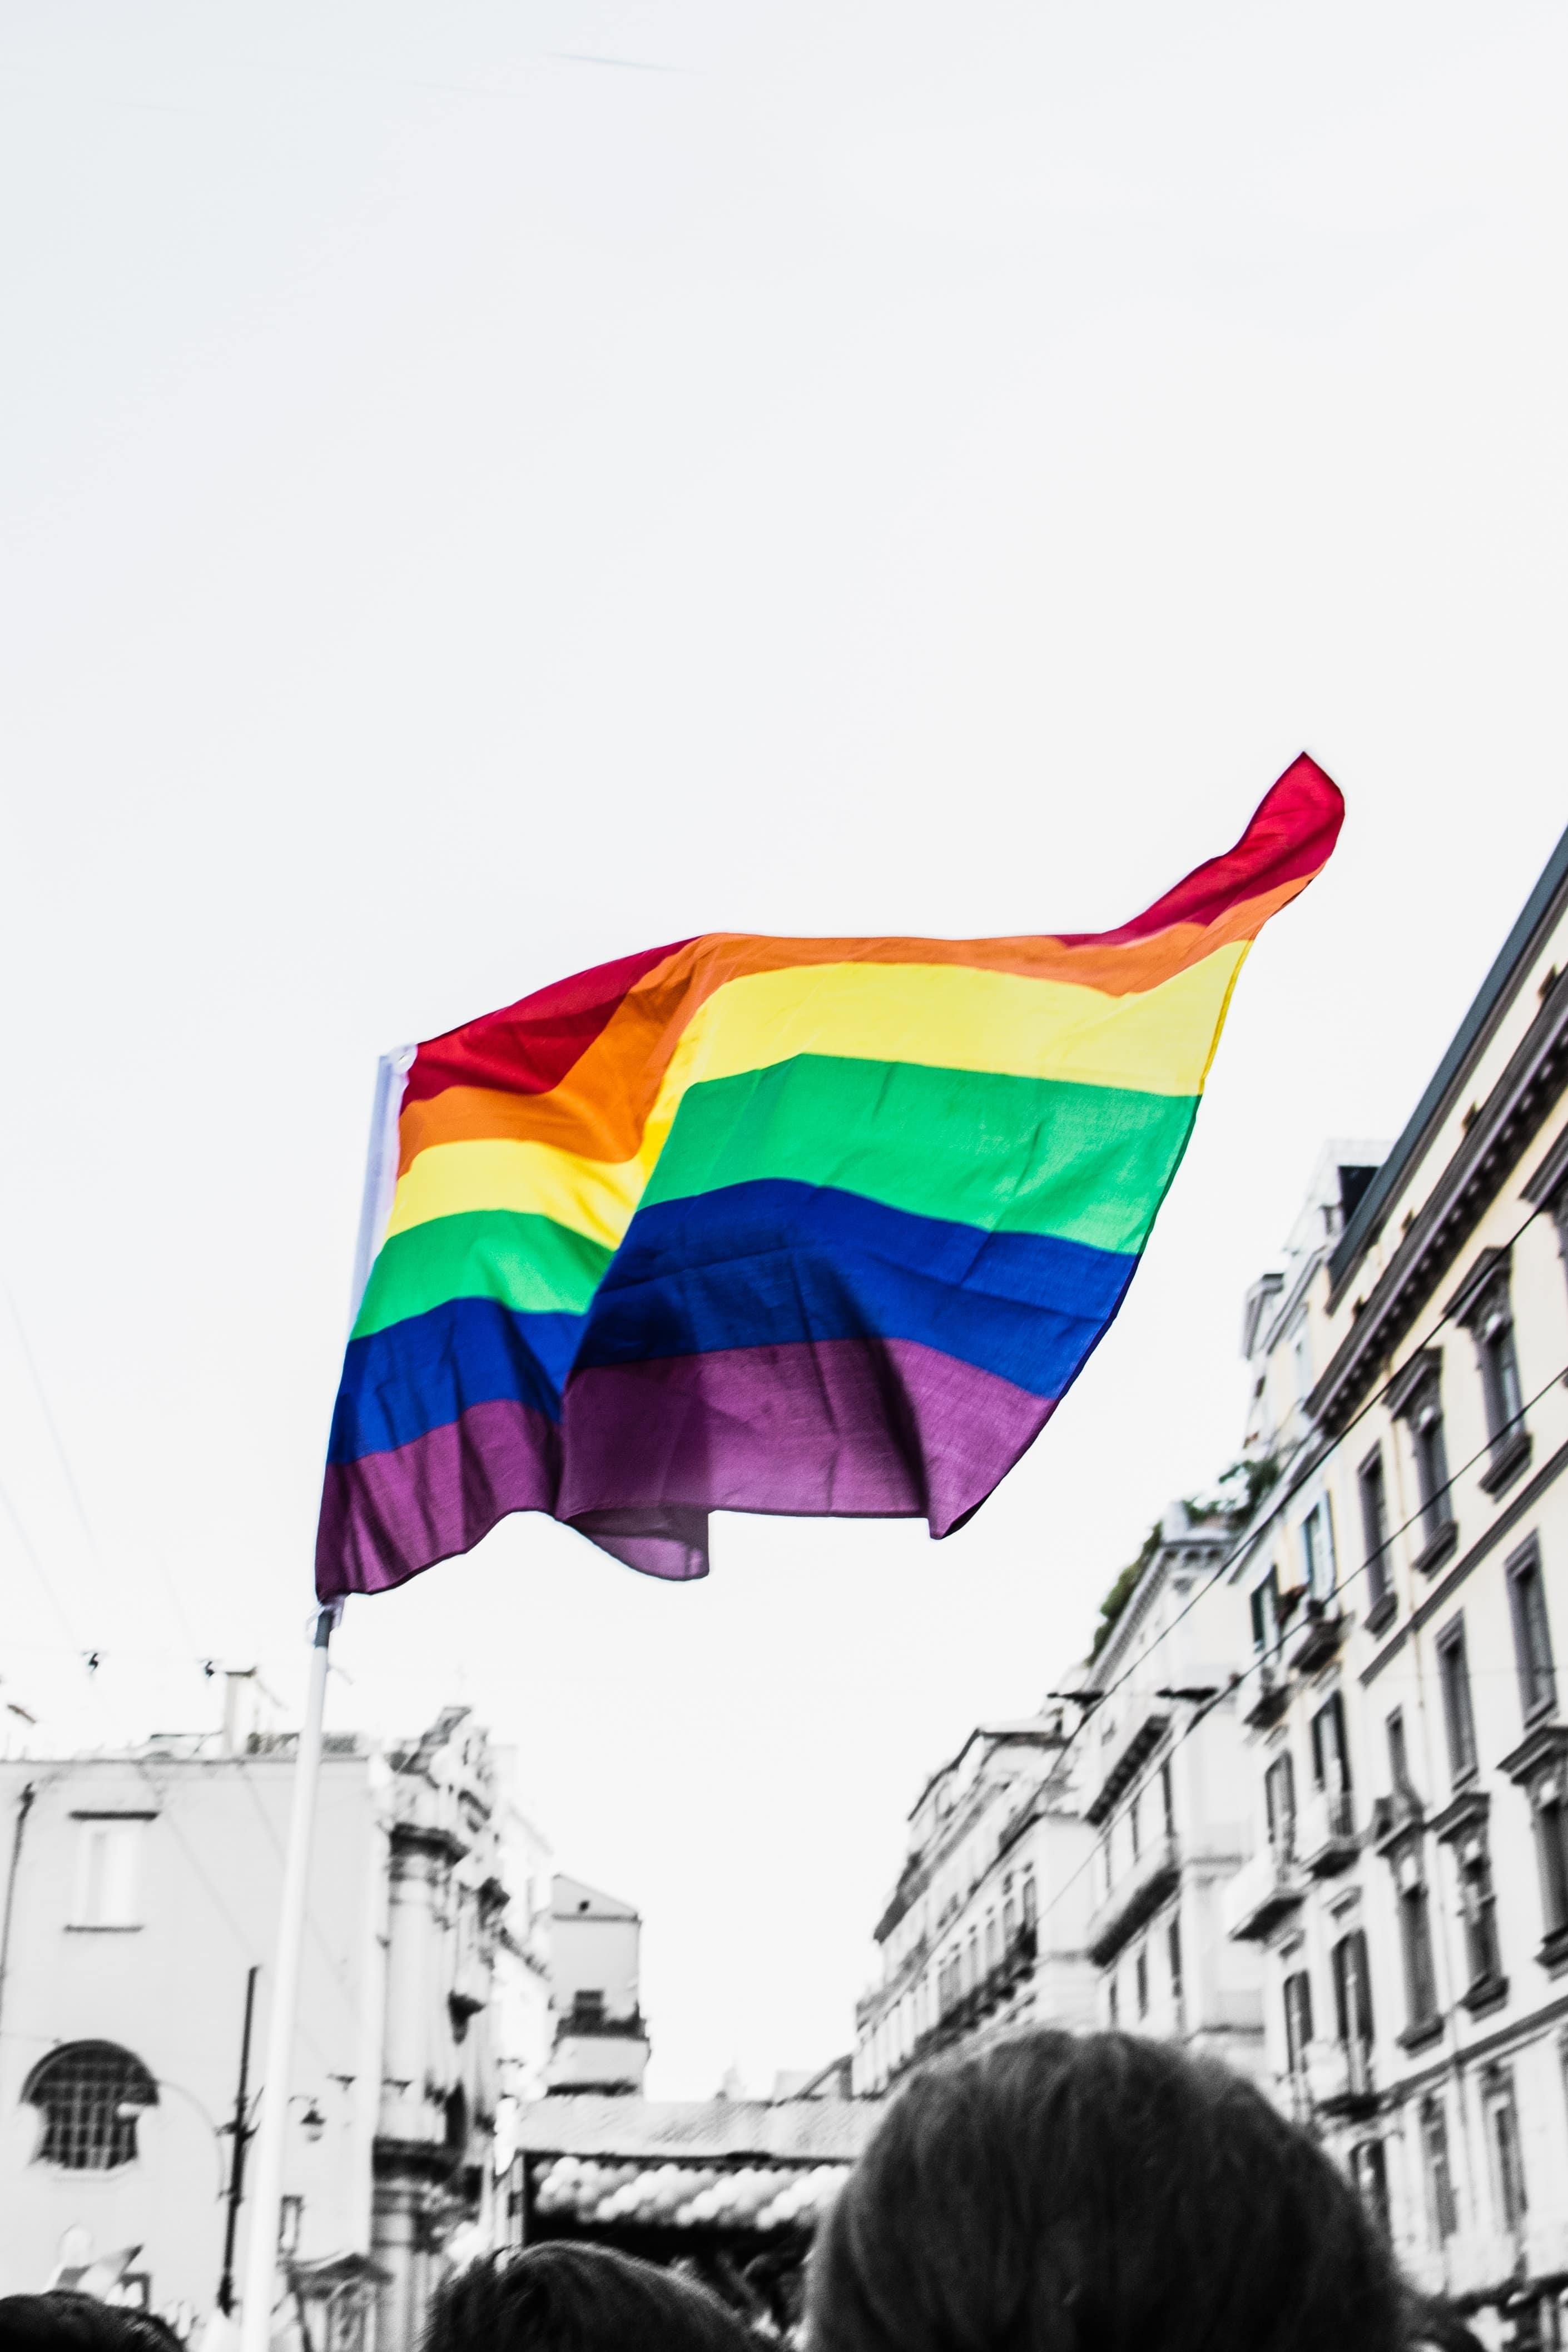 Bandiera arcobaleno